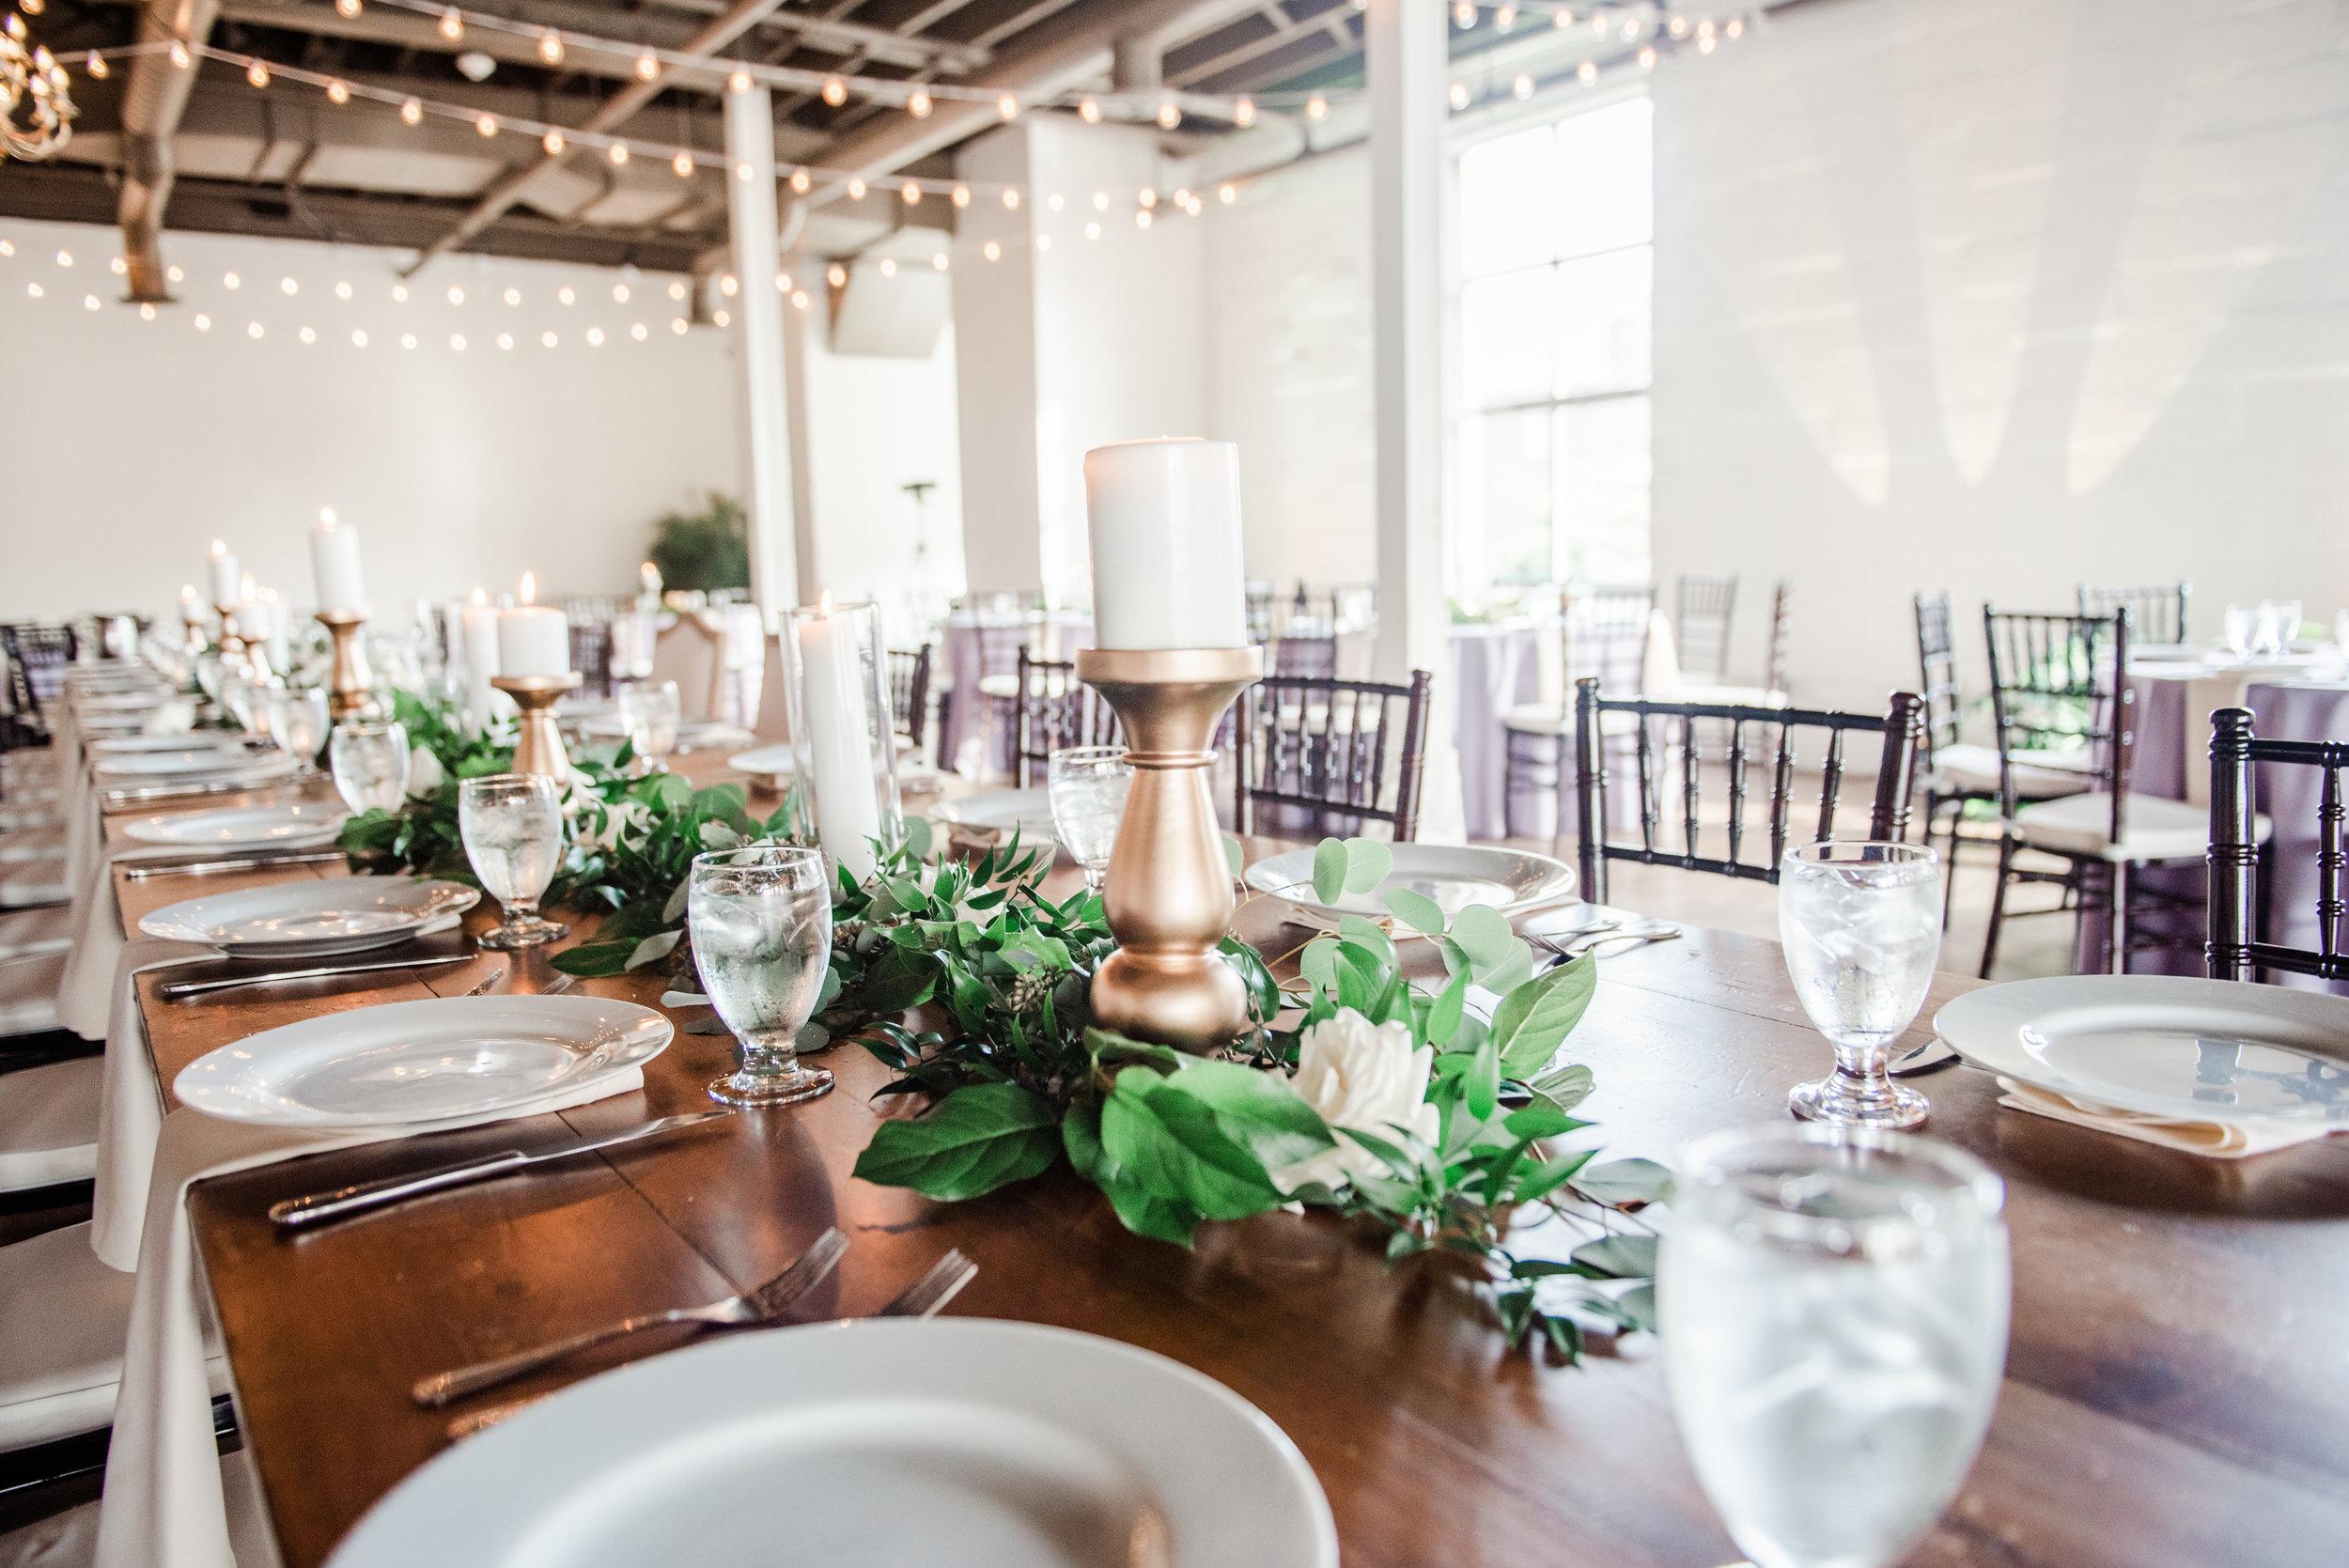 The_Arbor_Loft_Rochester_Wedding_JILL_STUDIO_Rochester_NY_Photographer_173818.jpg